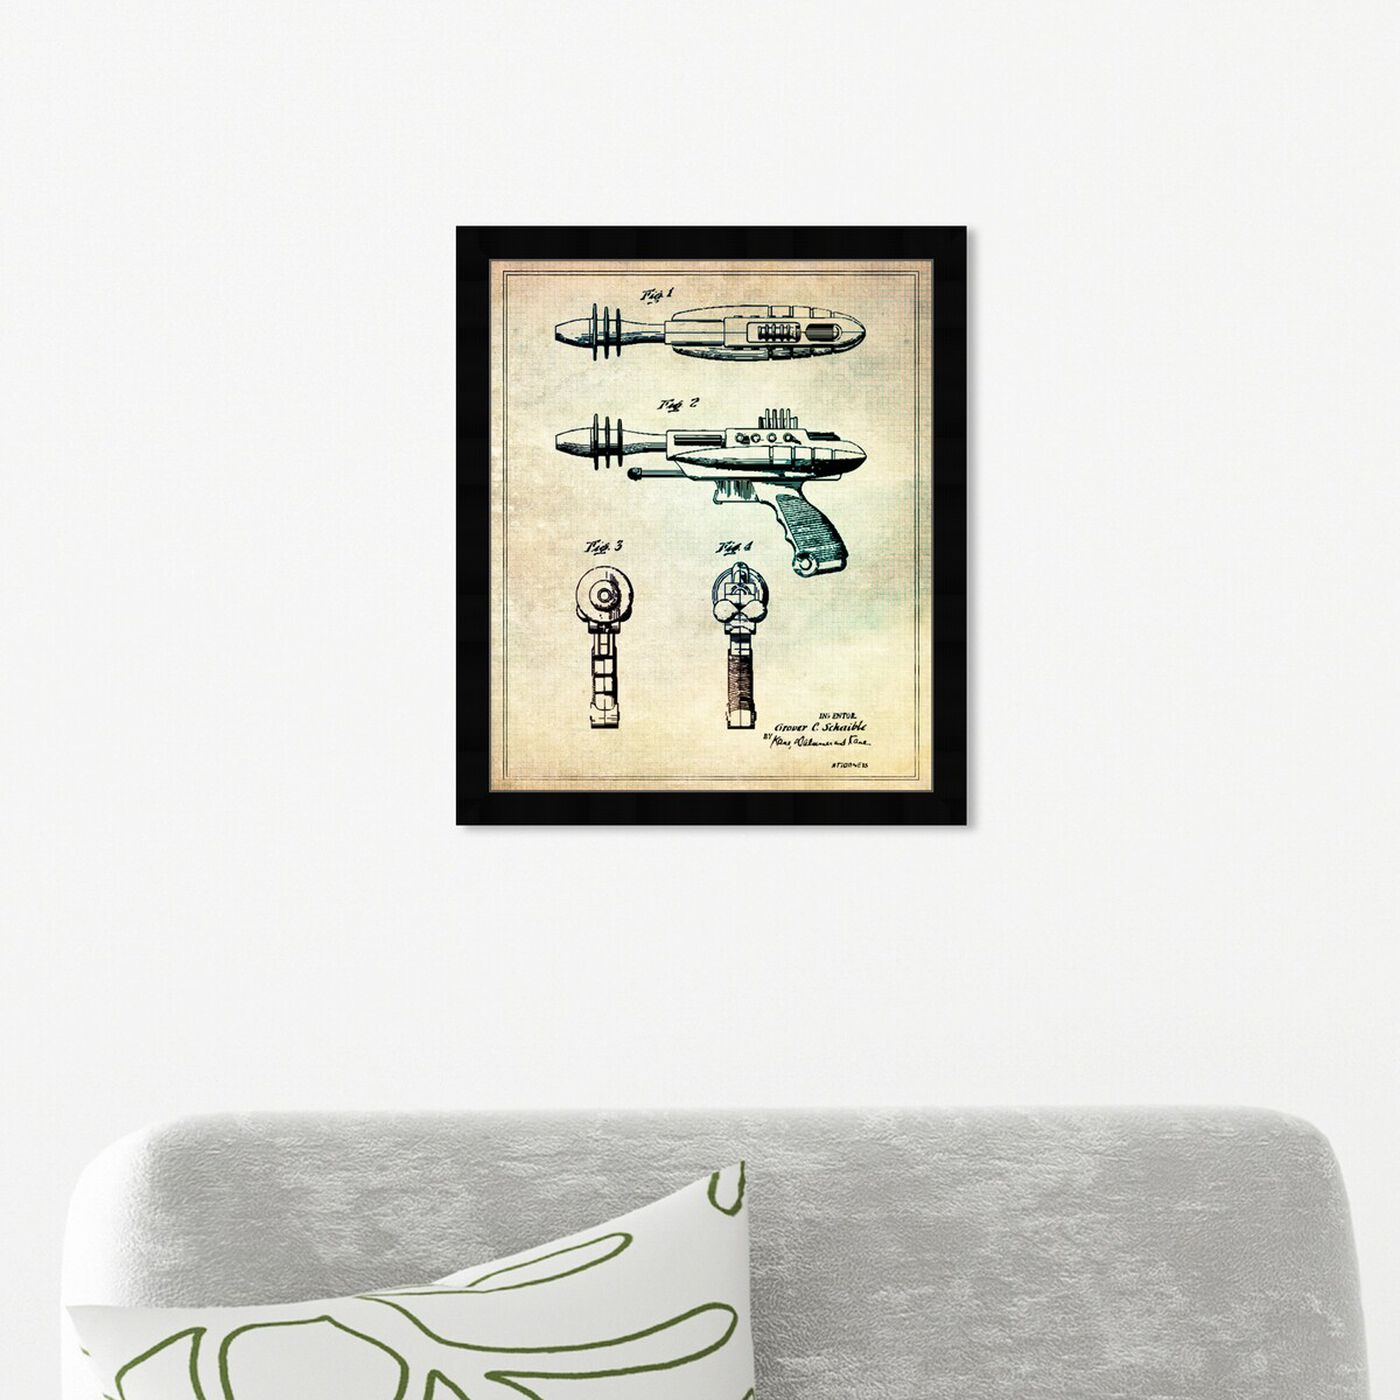 Hanging view of Pyrotomic Disintegrator Gun, 1963 featuring entertainment and hobbies and machine guns art.